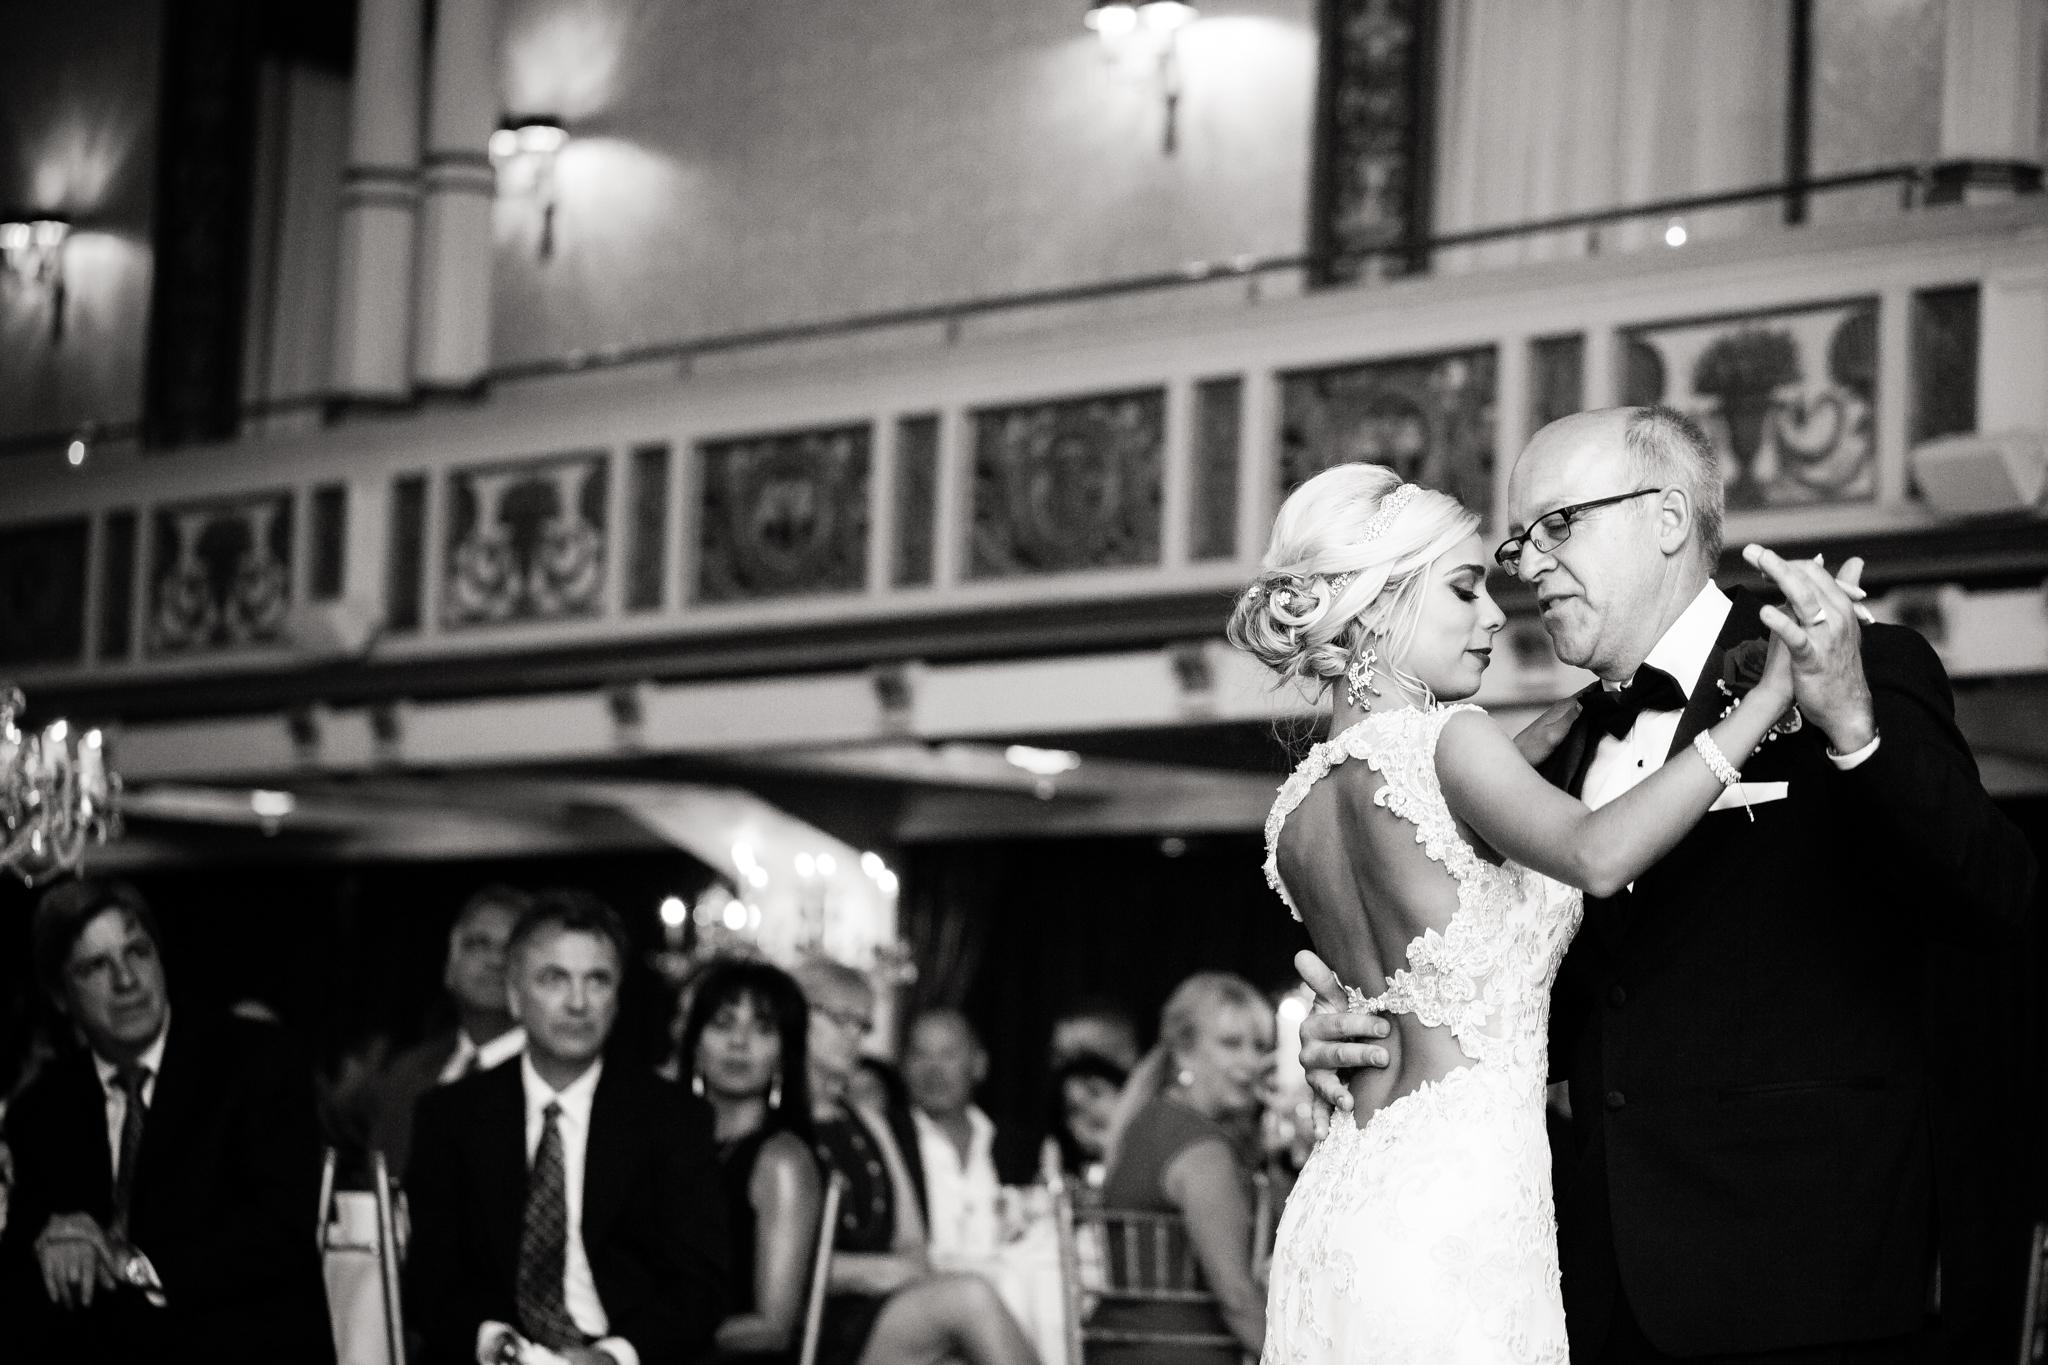 Statler-City-Buffalo-wedding-photographer- 0551bw.jpg